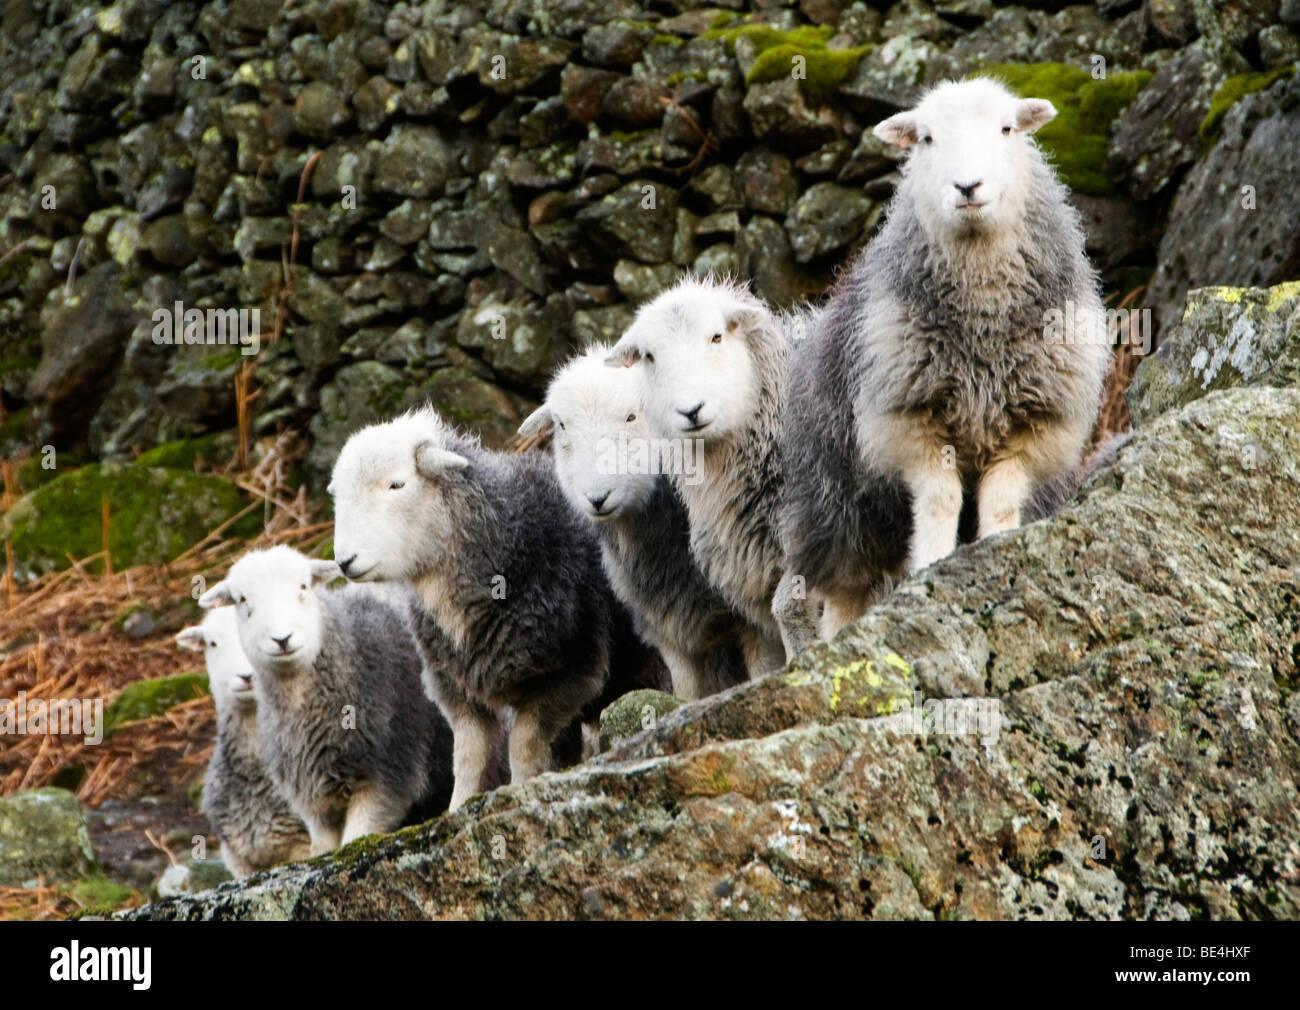 Flock of sheep, Cumbria, UK Stock Photo